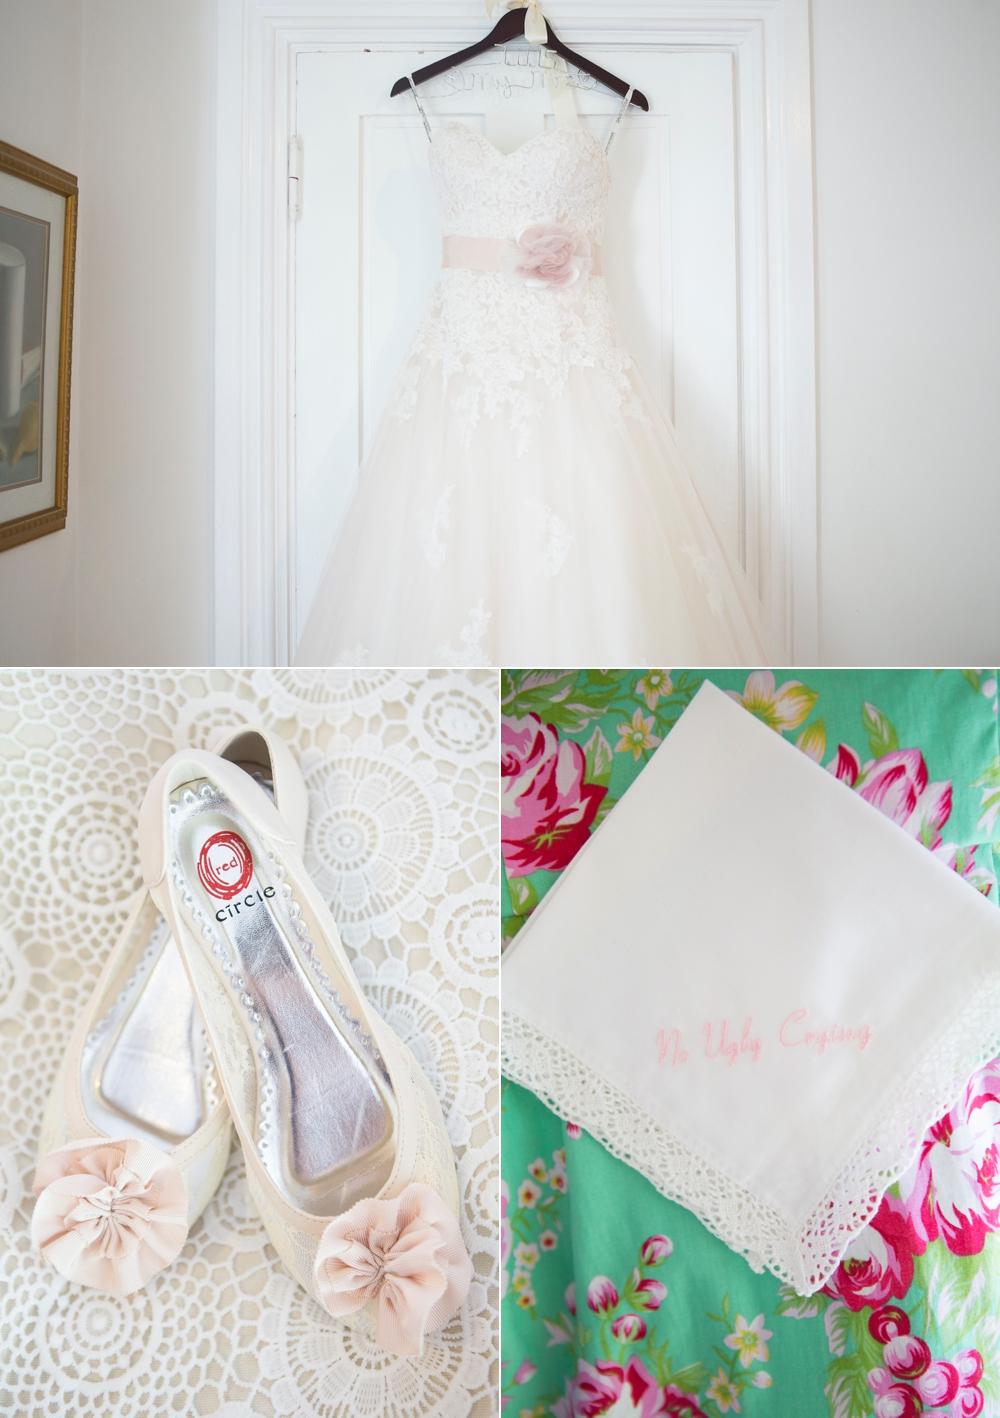 GreenvaleVineyards_Wedding_Missy&Joe_0003.jpg